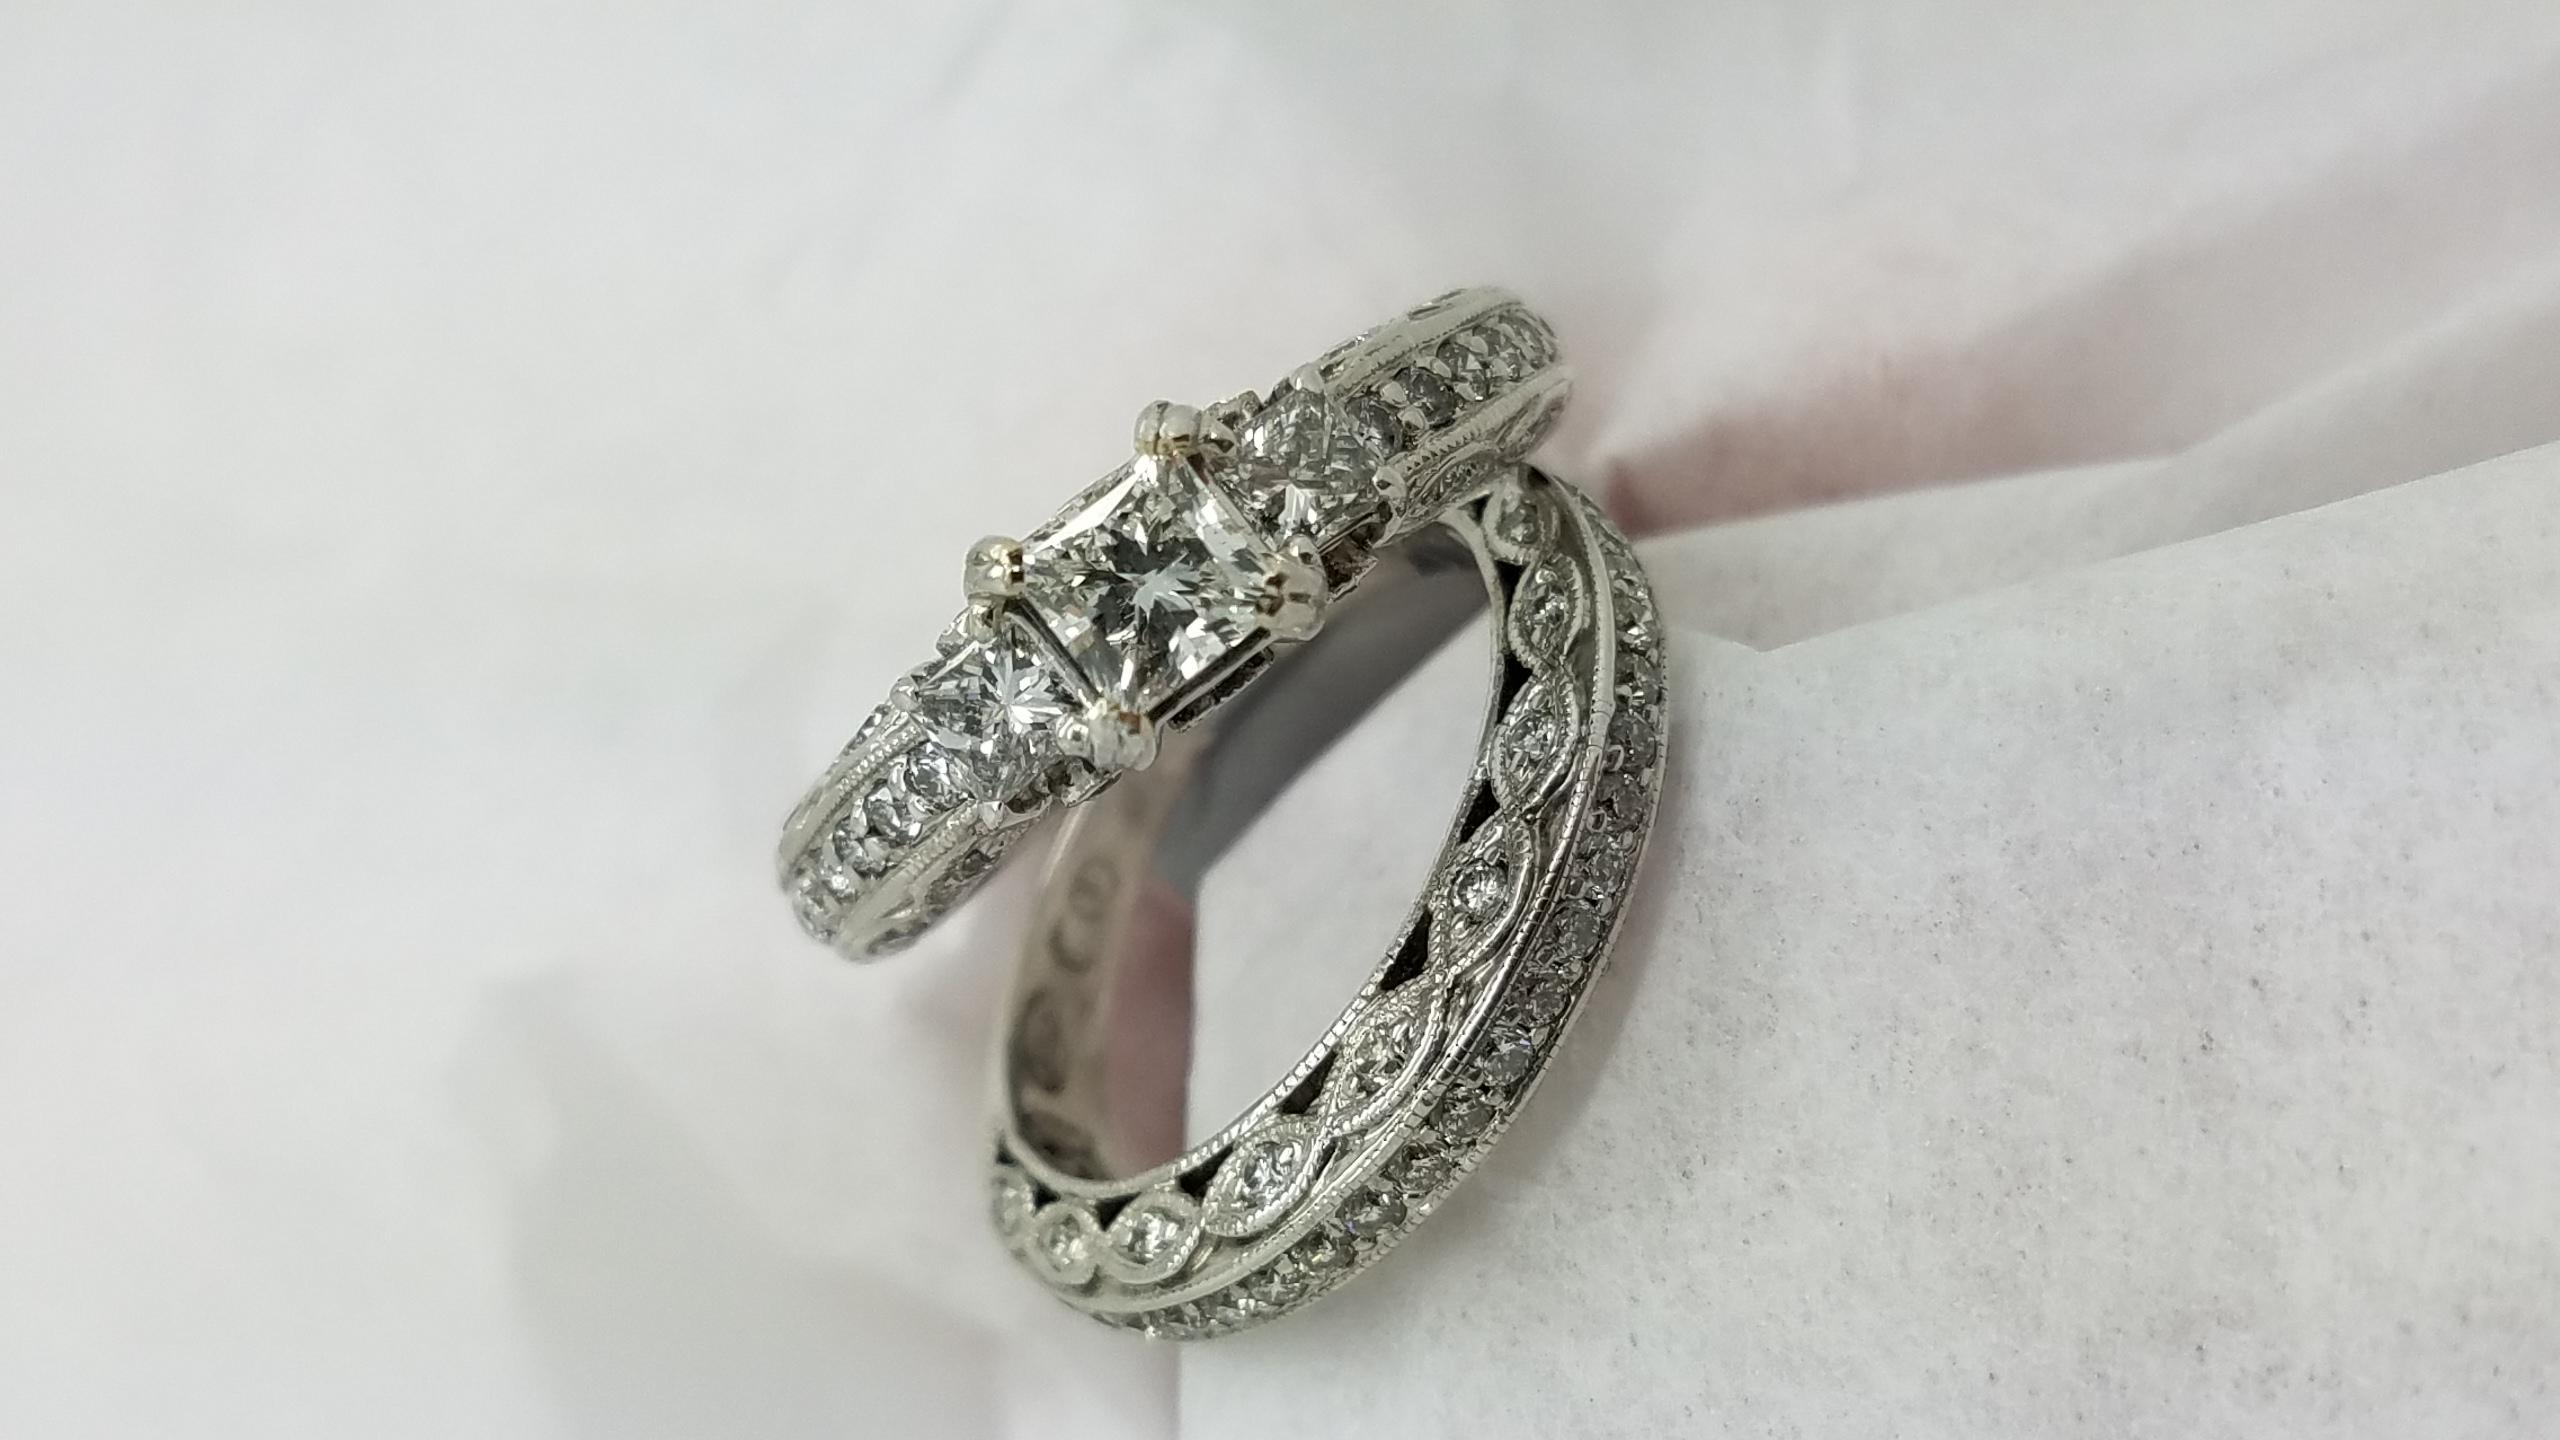 14KWhite Goldw/ Matching wedding band1.50ct.PrincessCutDIAMONDPavé setSolitaire with AccentsEngagement-Ring